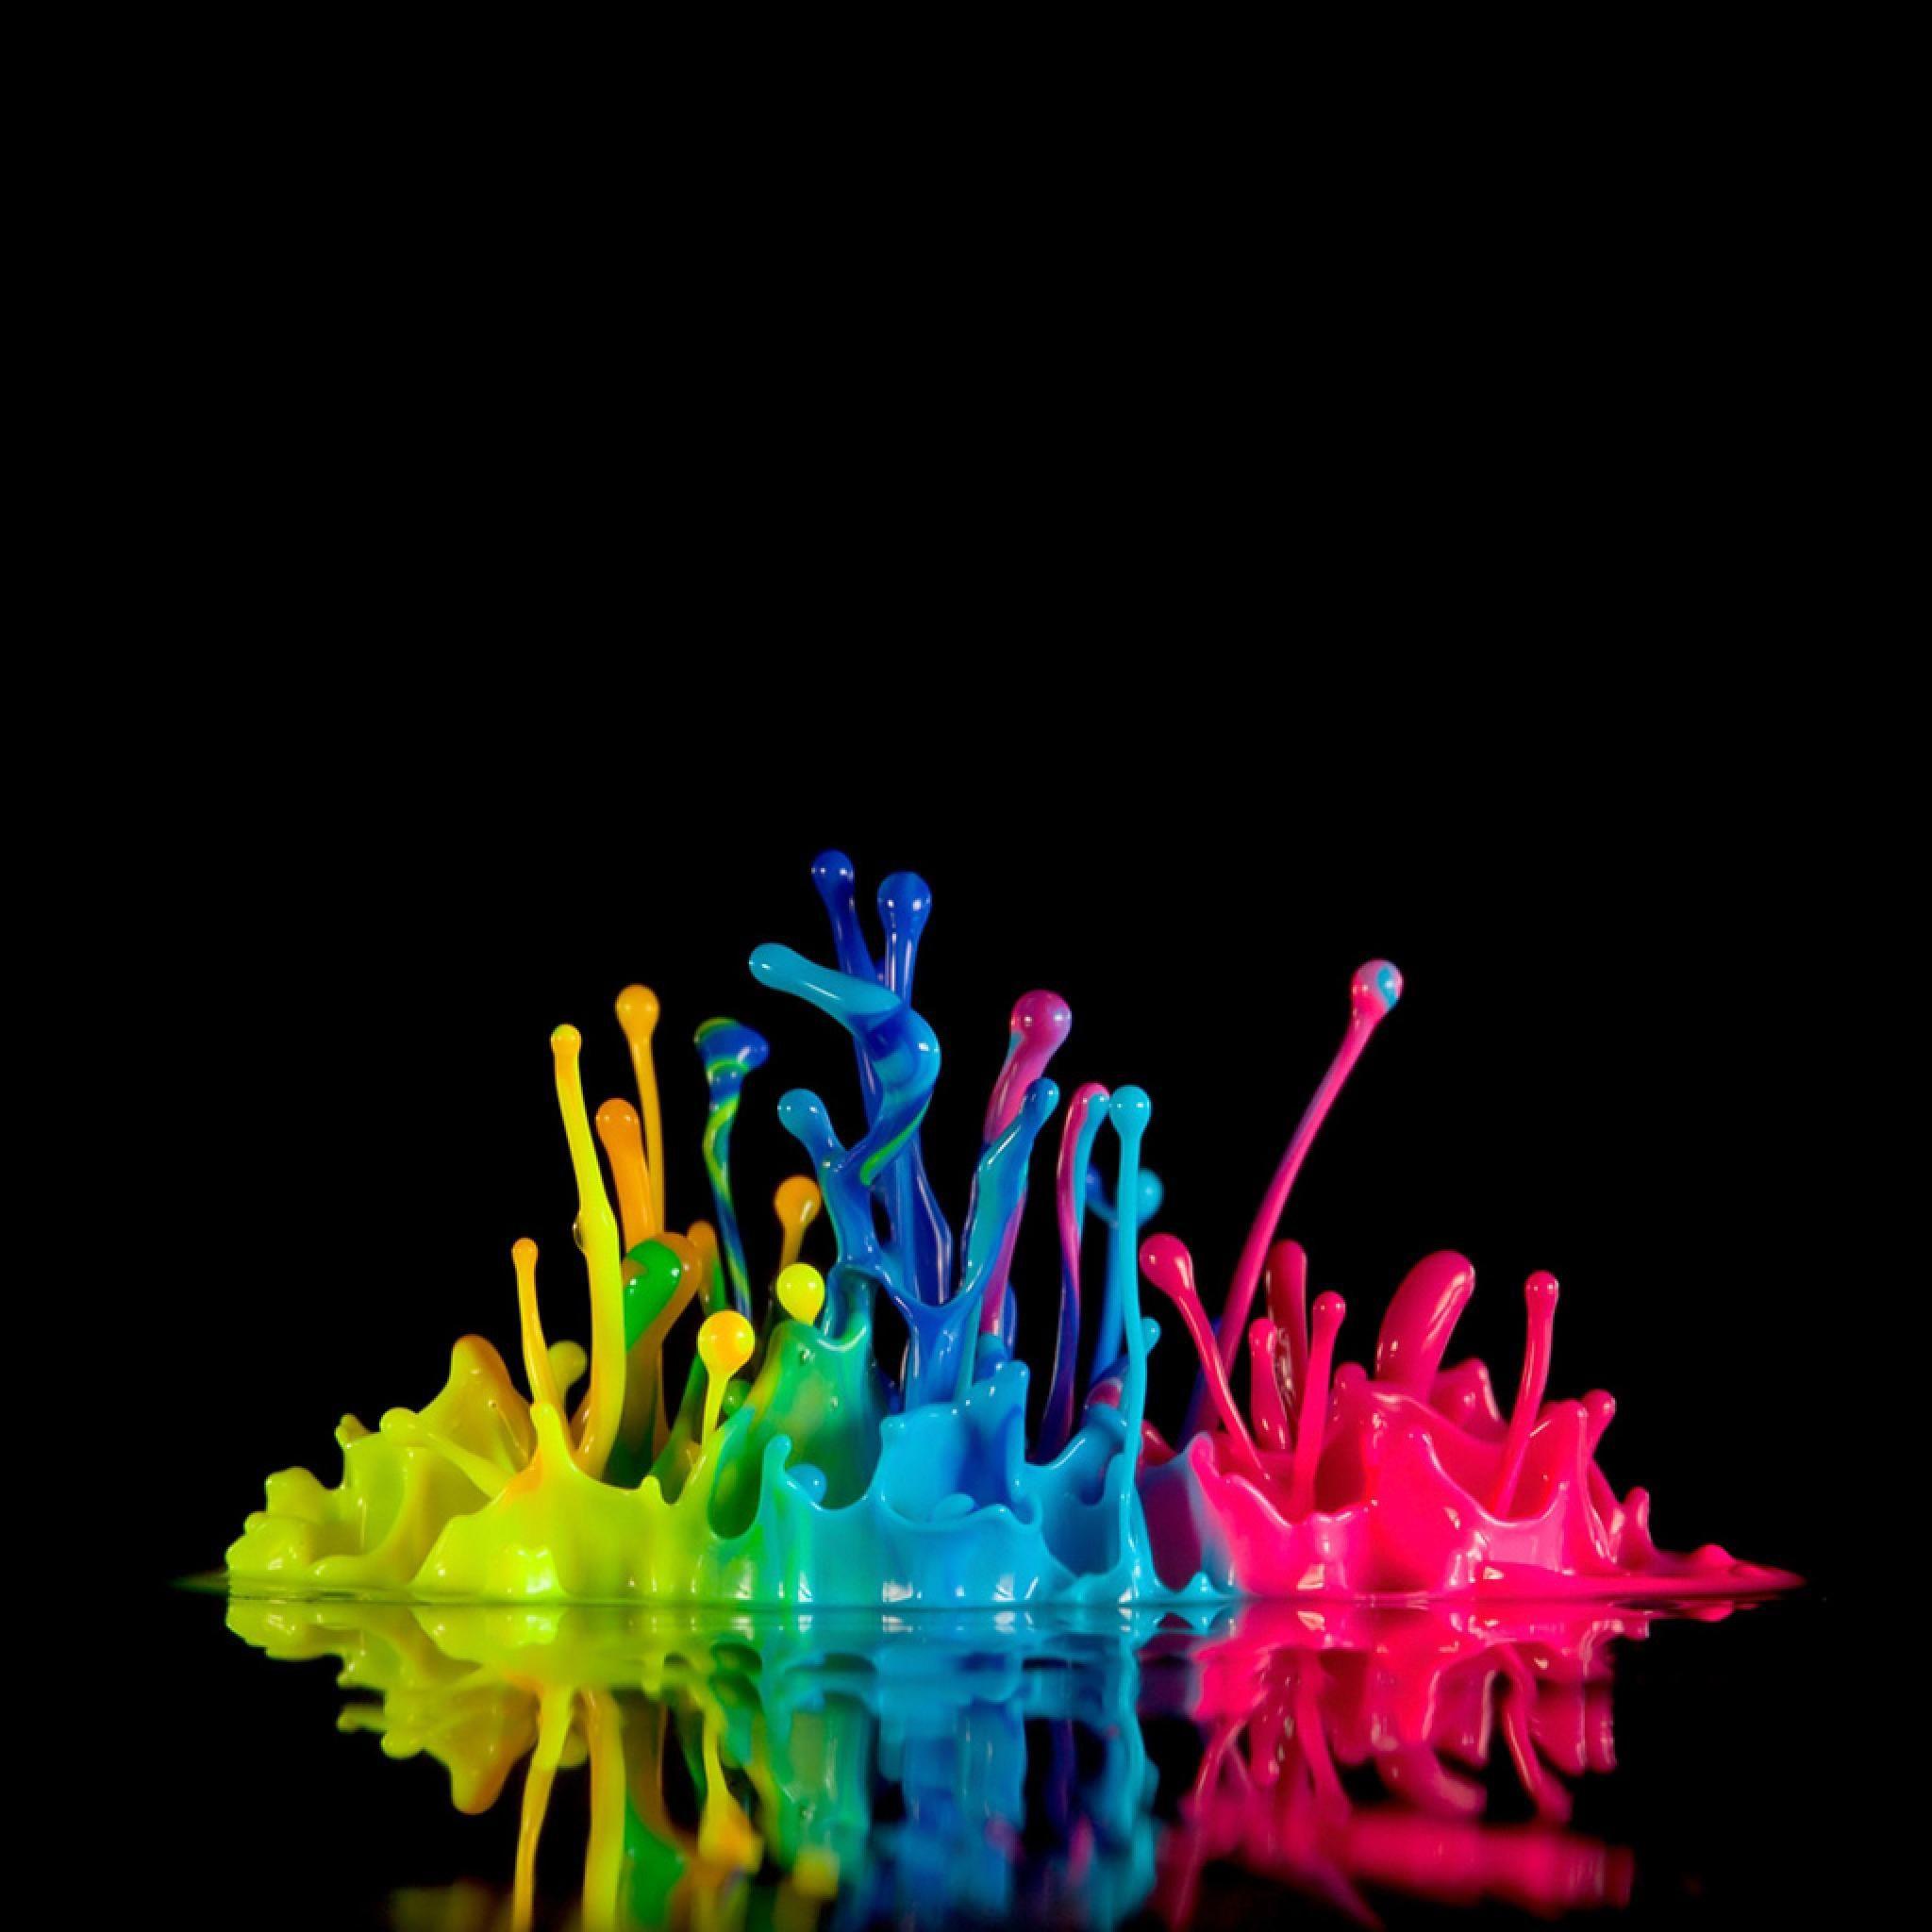 splashes of color | Miscellaneous Cool Fluorescent Paint Color ...